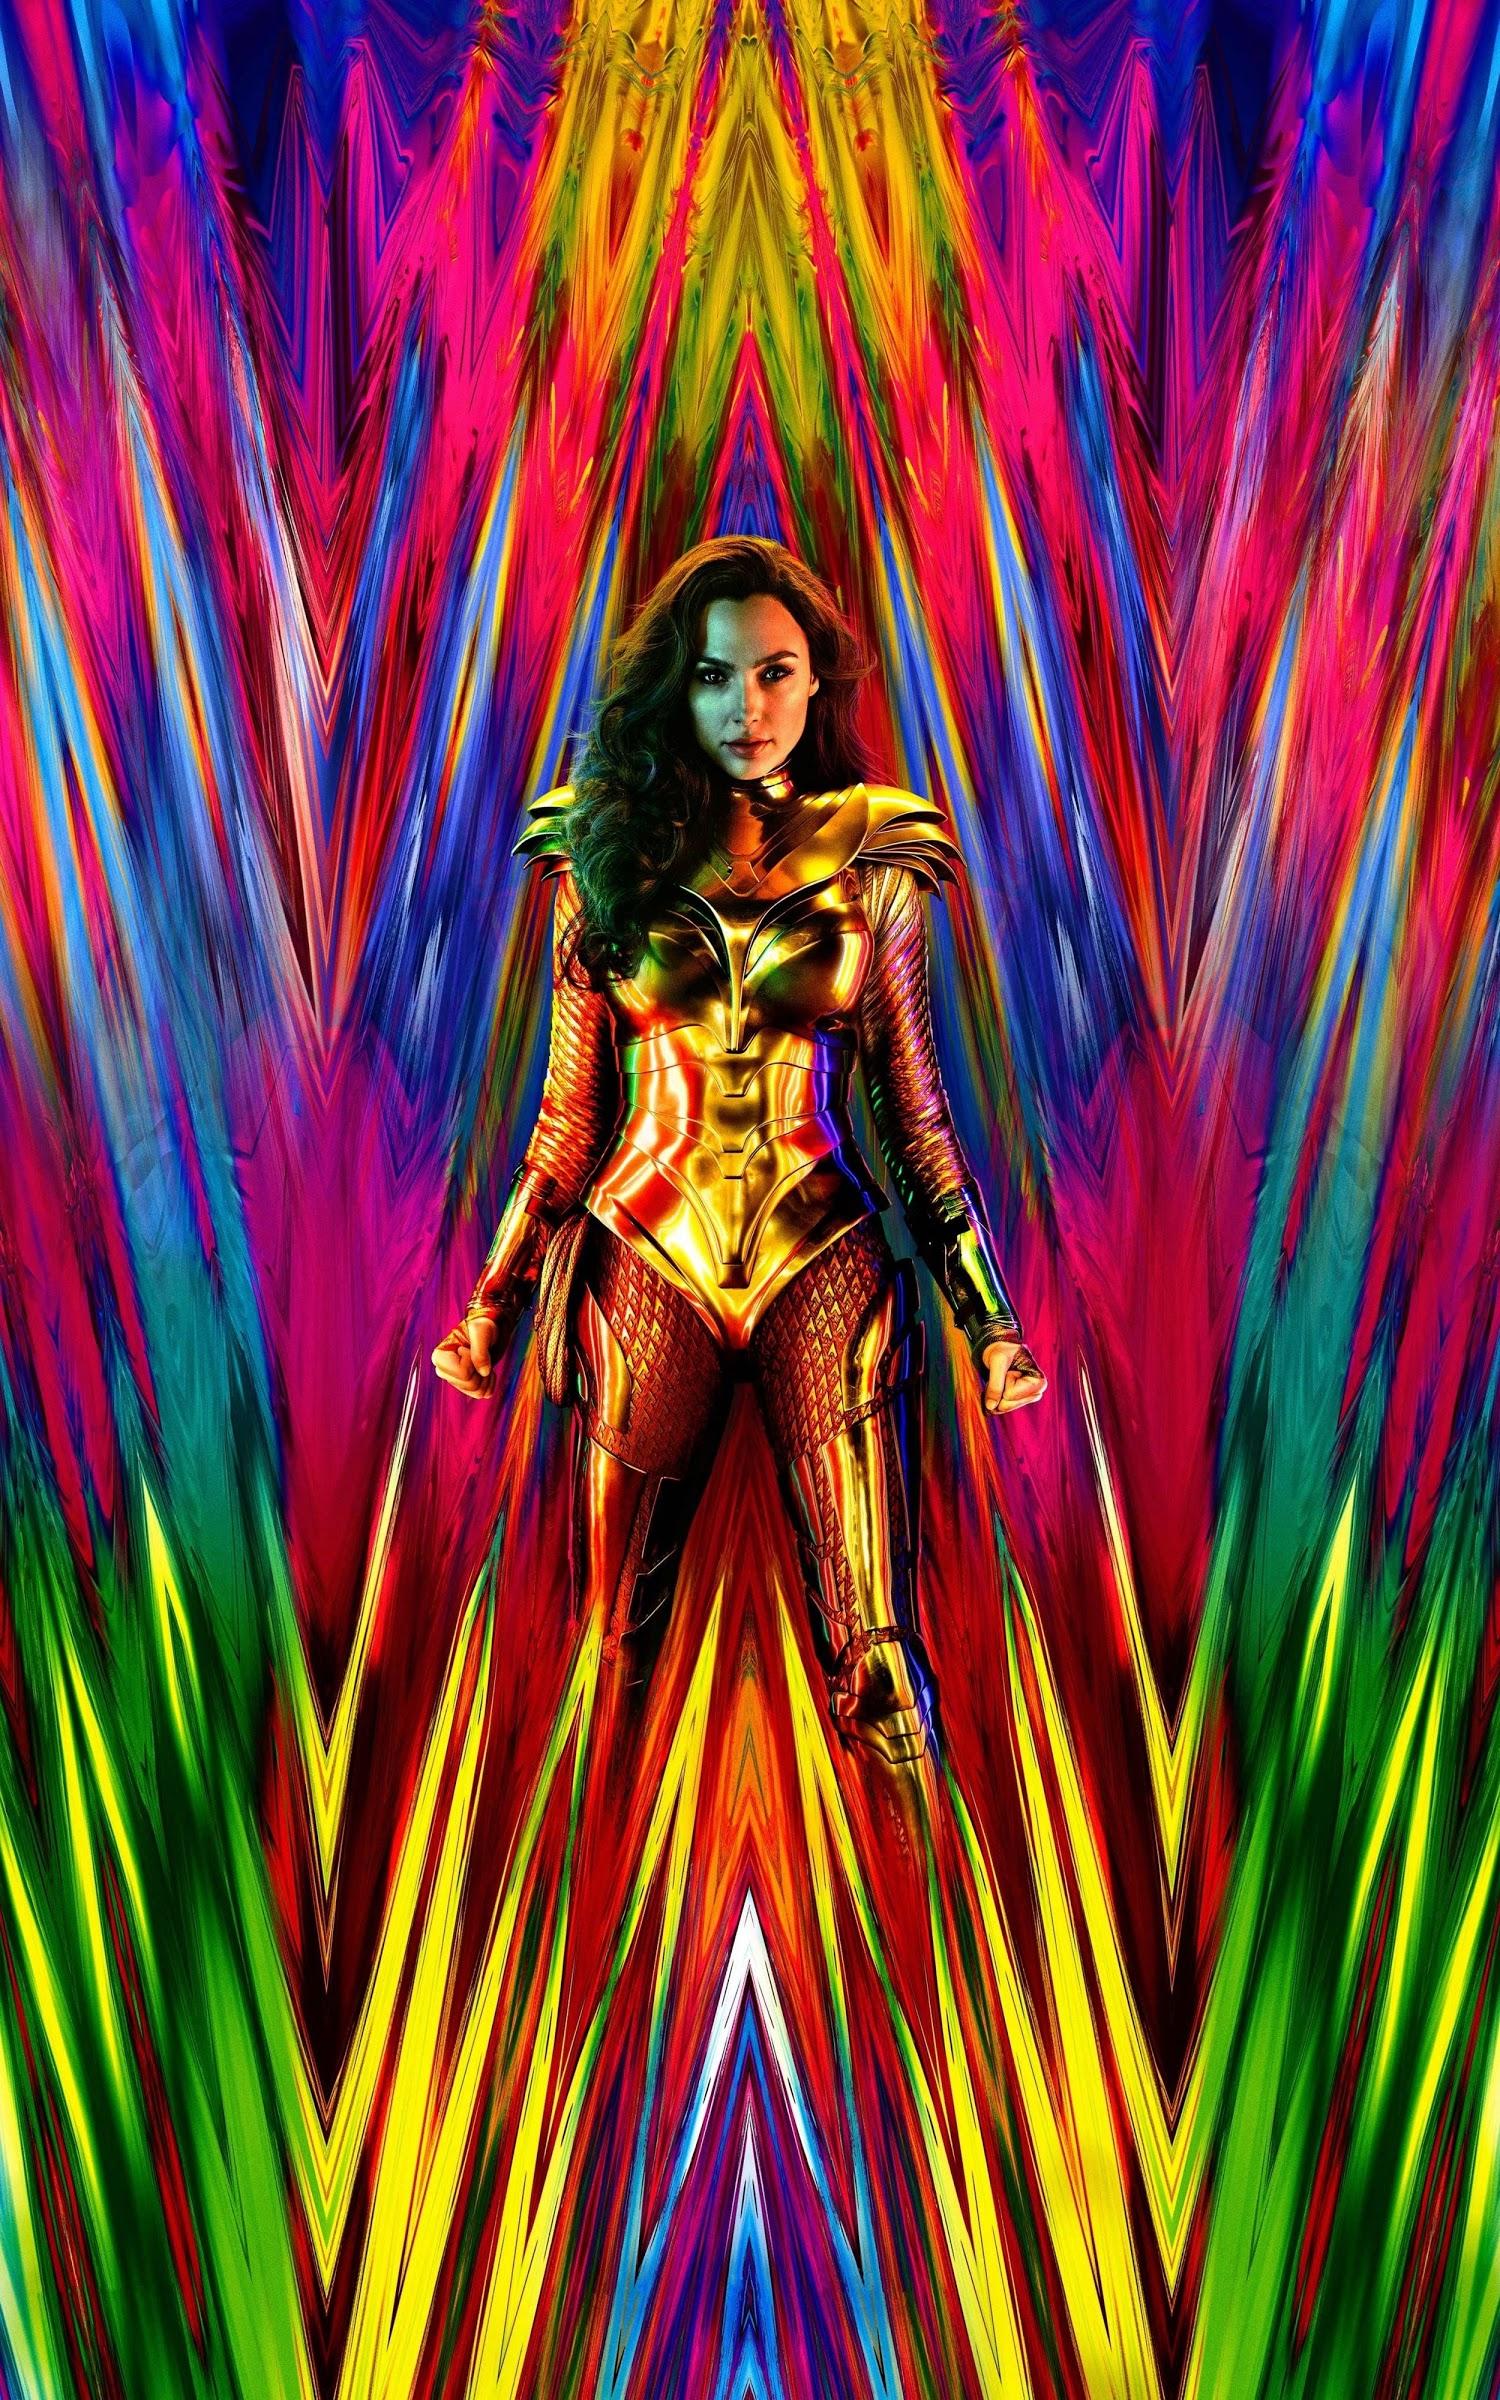 Wonder Woman 1984 2020 Wallpaper 4k Hero Collection Laginate Blog Do Armindo In 2020 Wonder Woman Chris Pine 1984 Movie